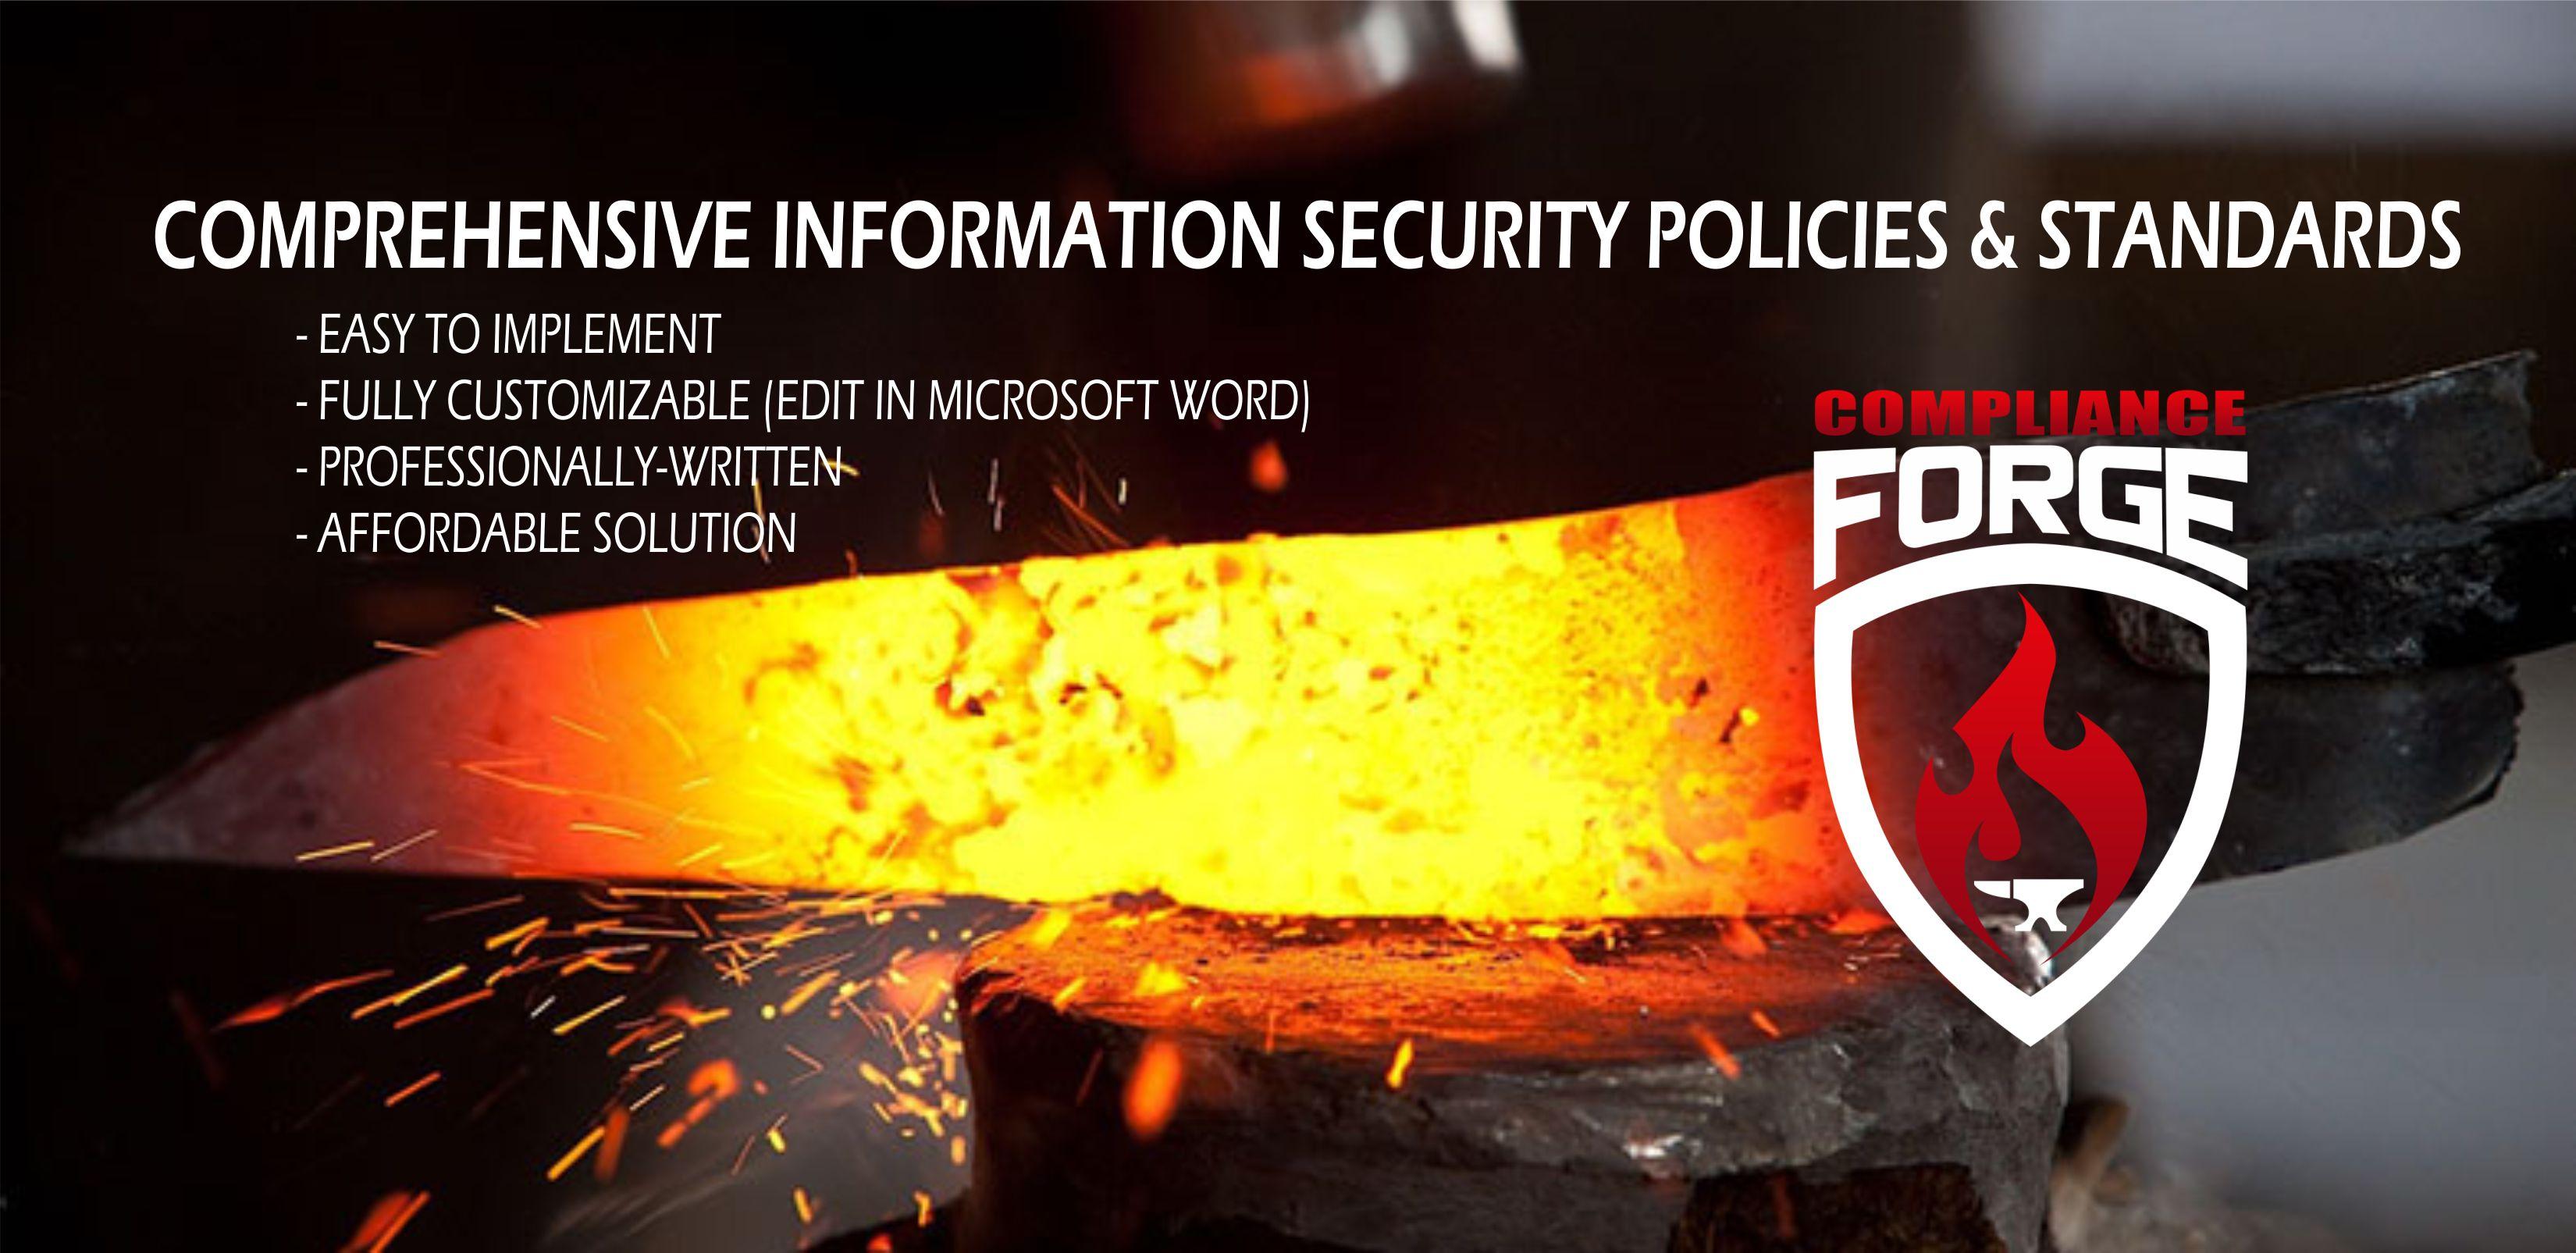 Information Security Nist Information Security Standards - Information security policy template nist